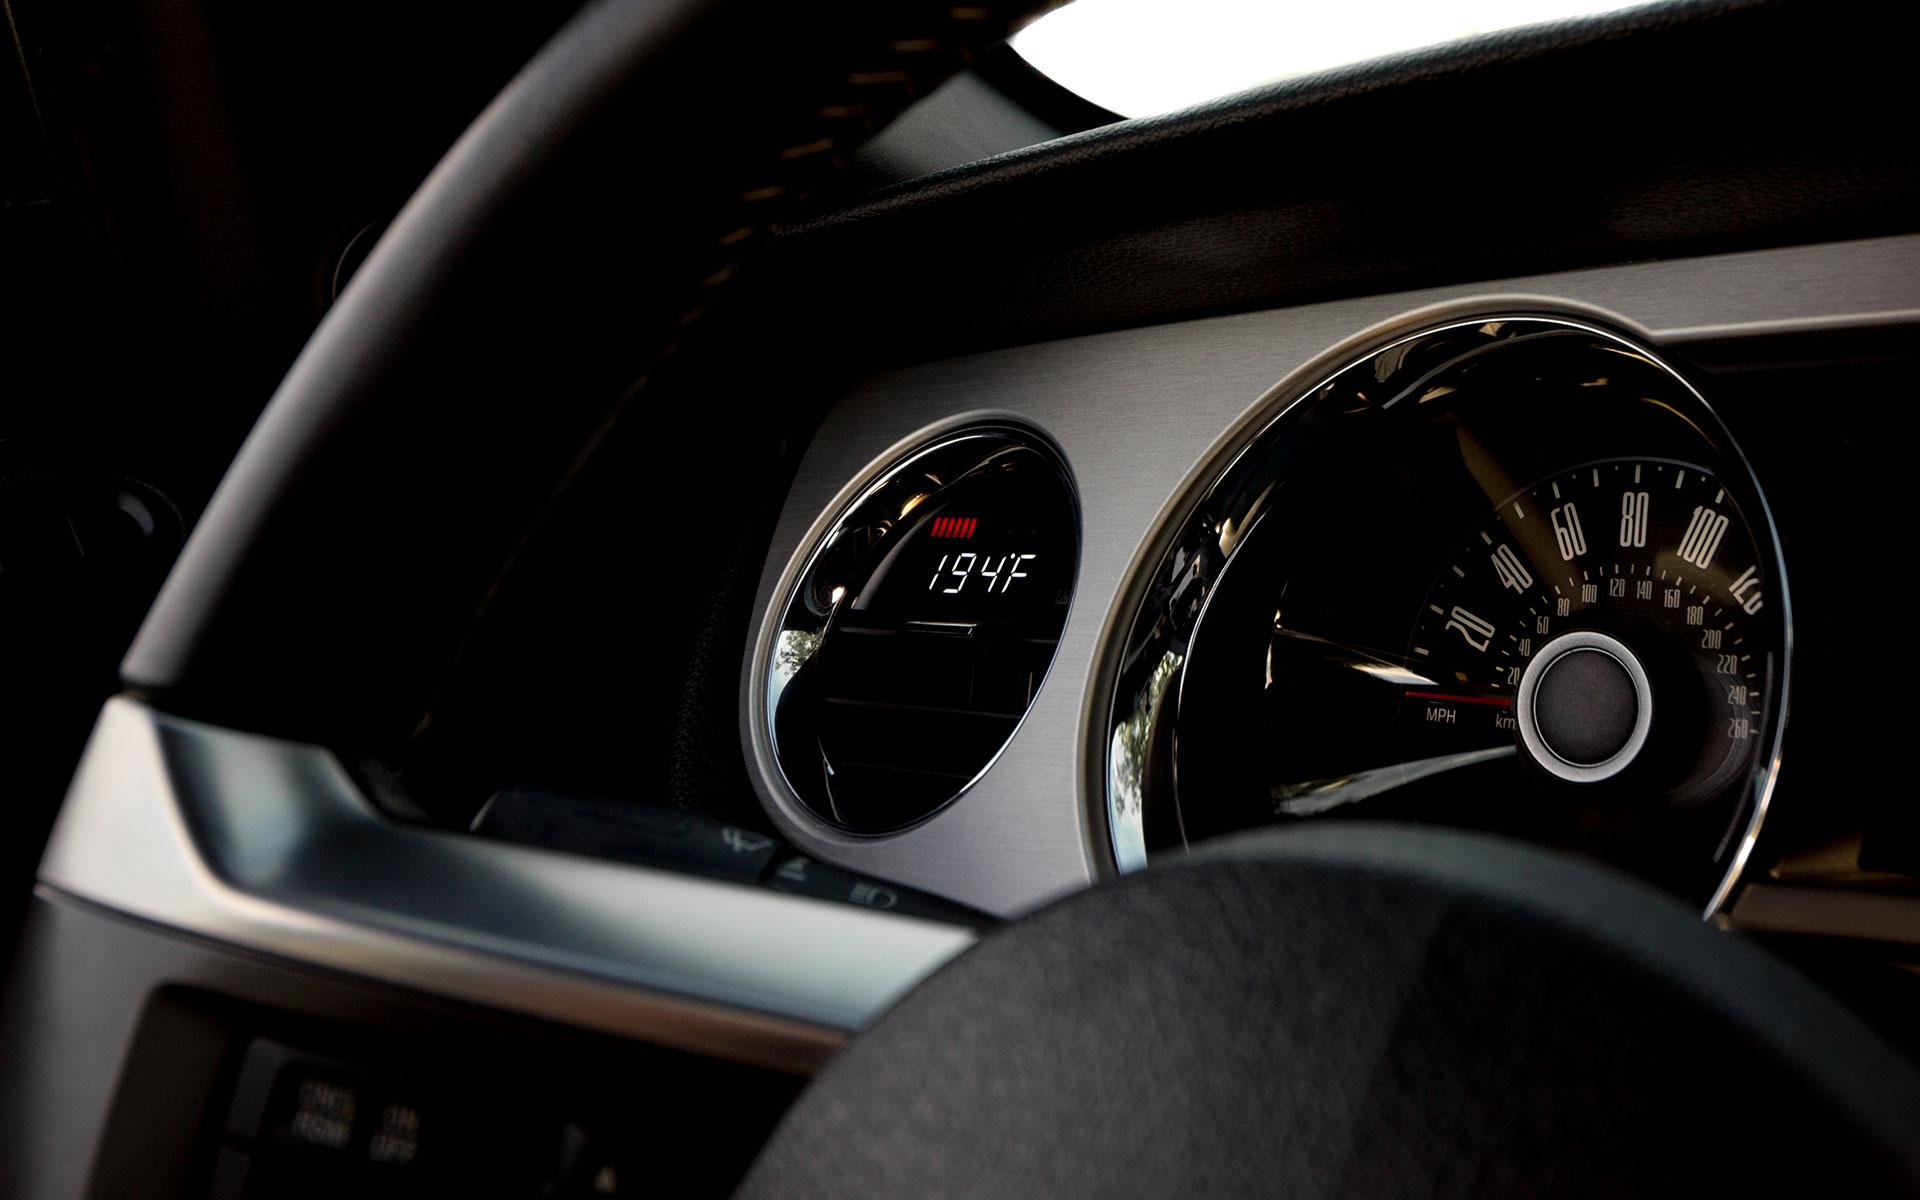 Ford Mustang GT Gen5 Dash